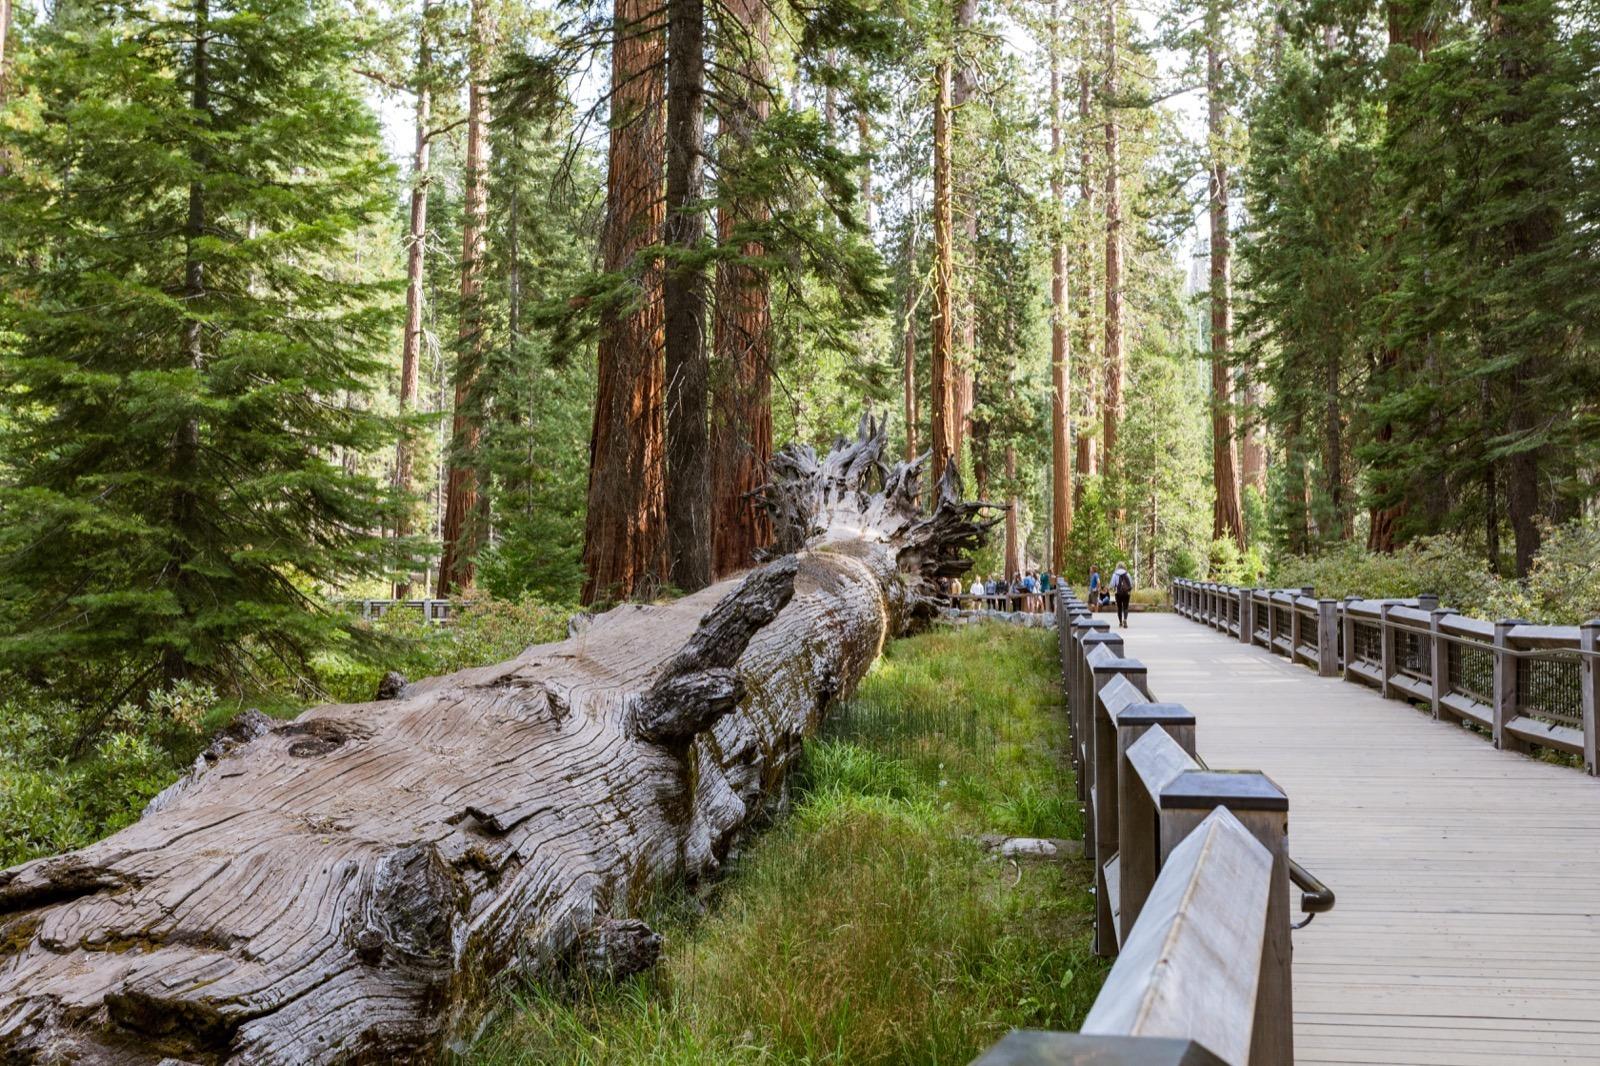 california-high-sierra-madera-yosemite-national-park-mariposa-grove-giant-sequoia-2